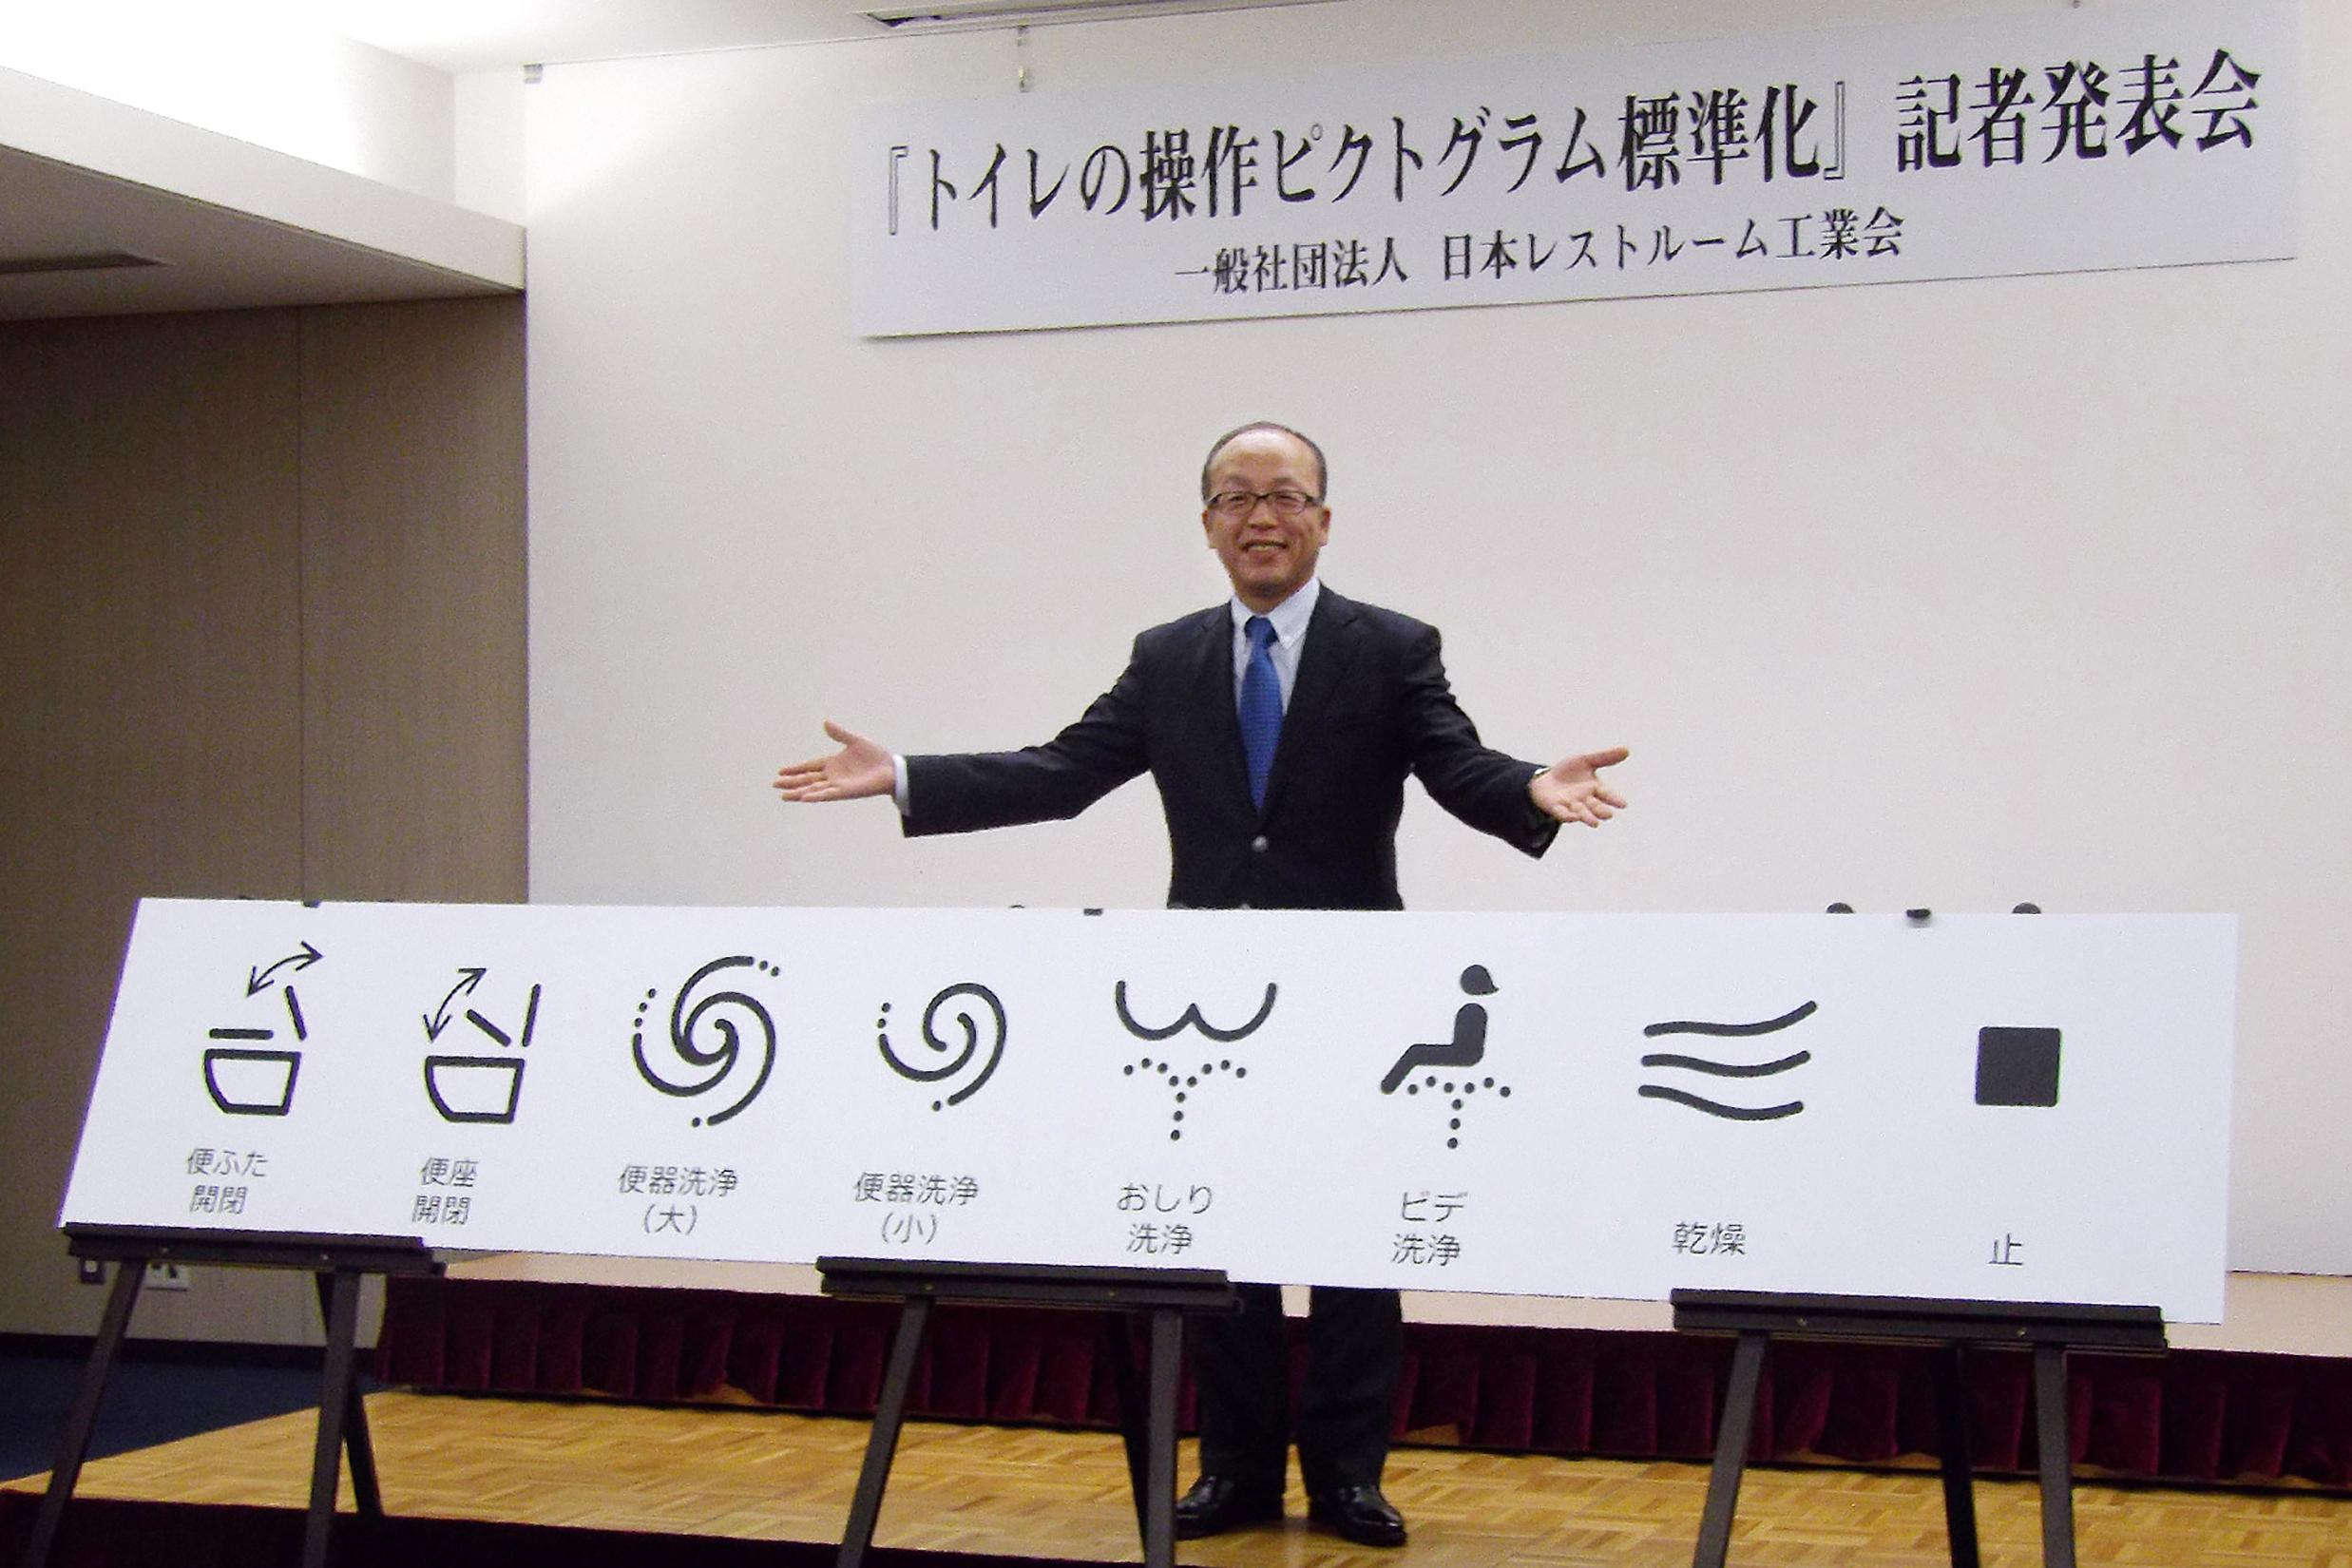 JAPAN-TOILET-CULTURE-OFFBEAT